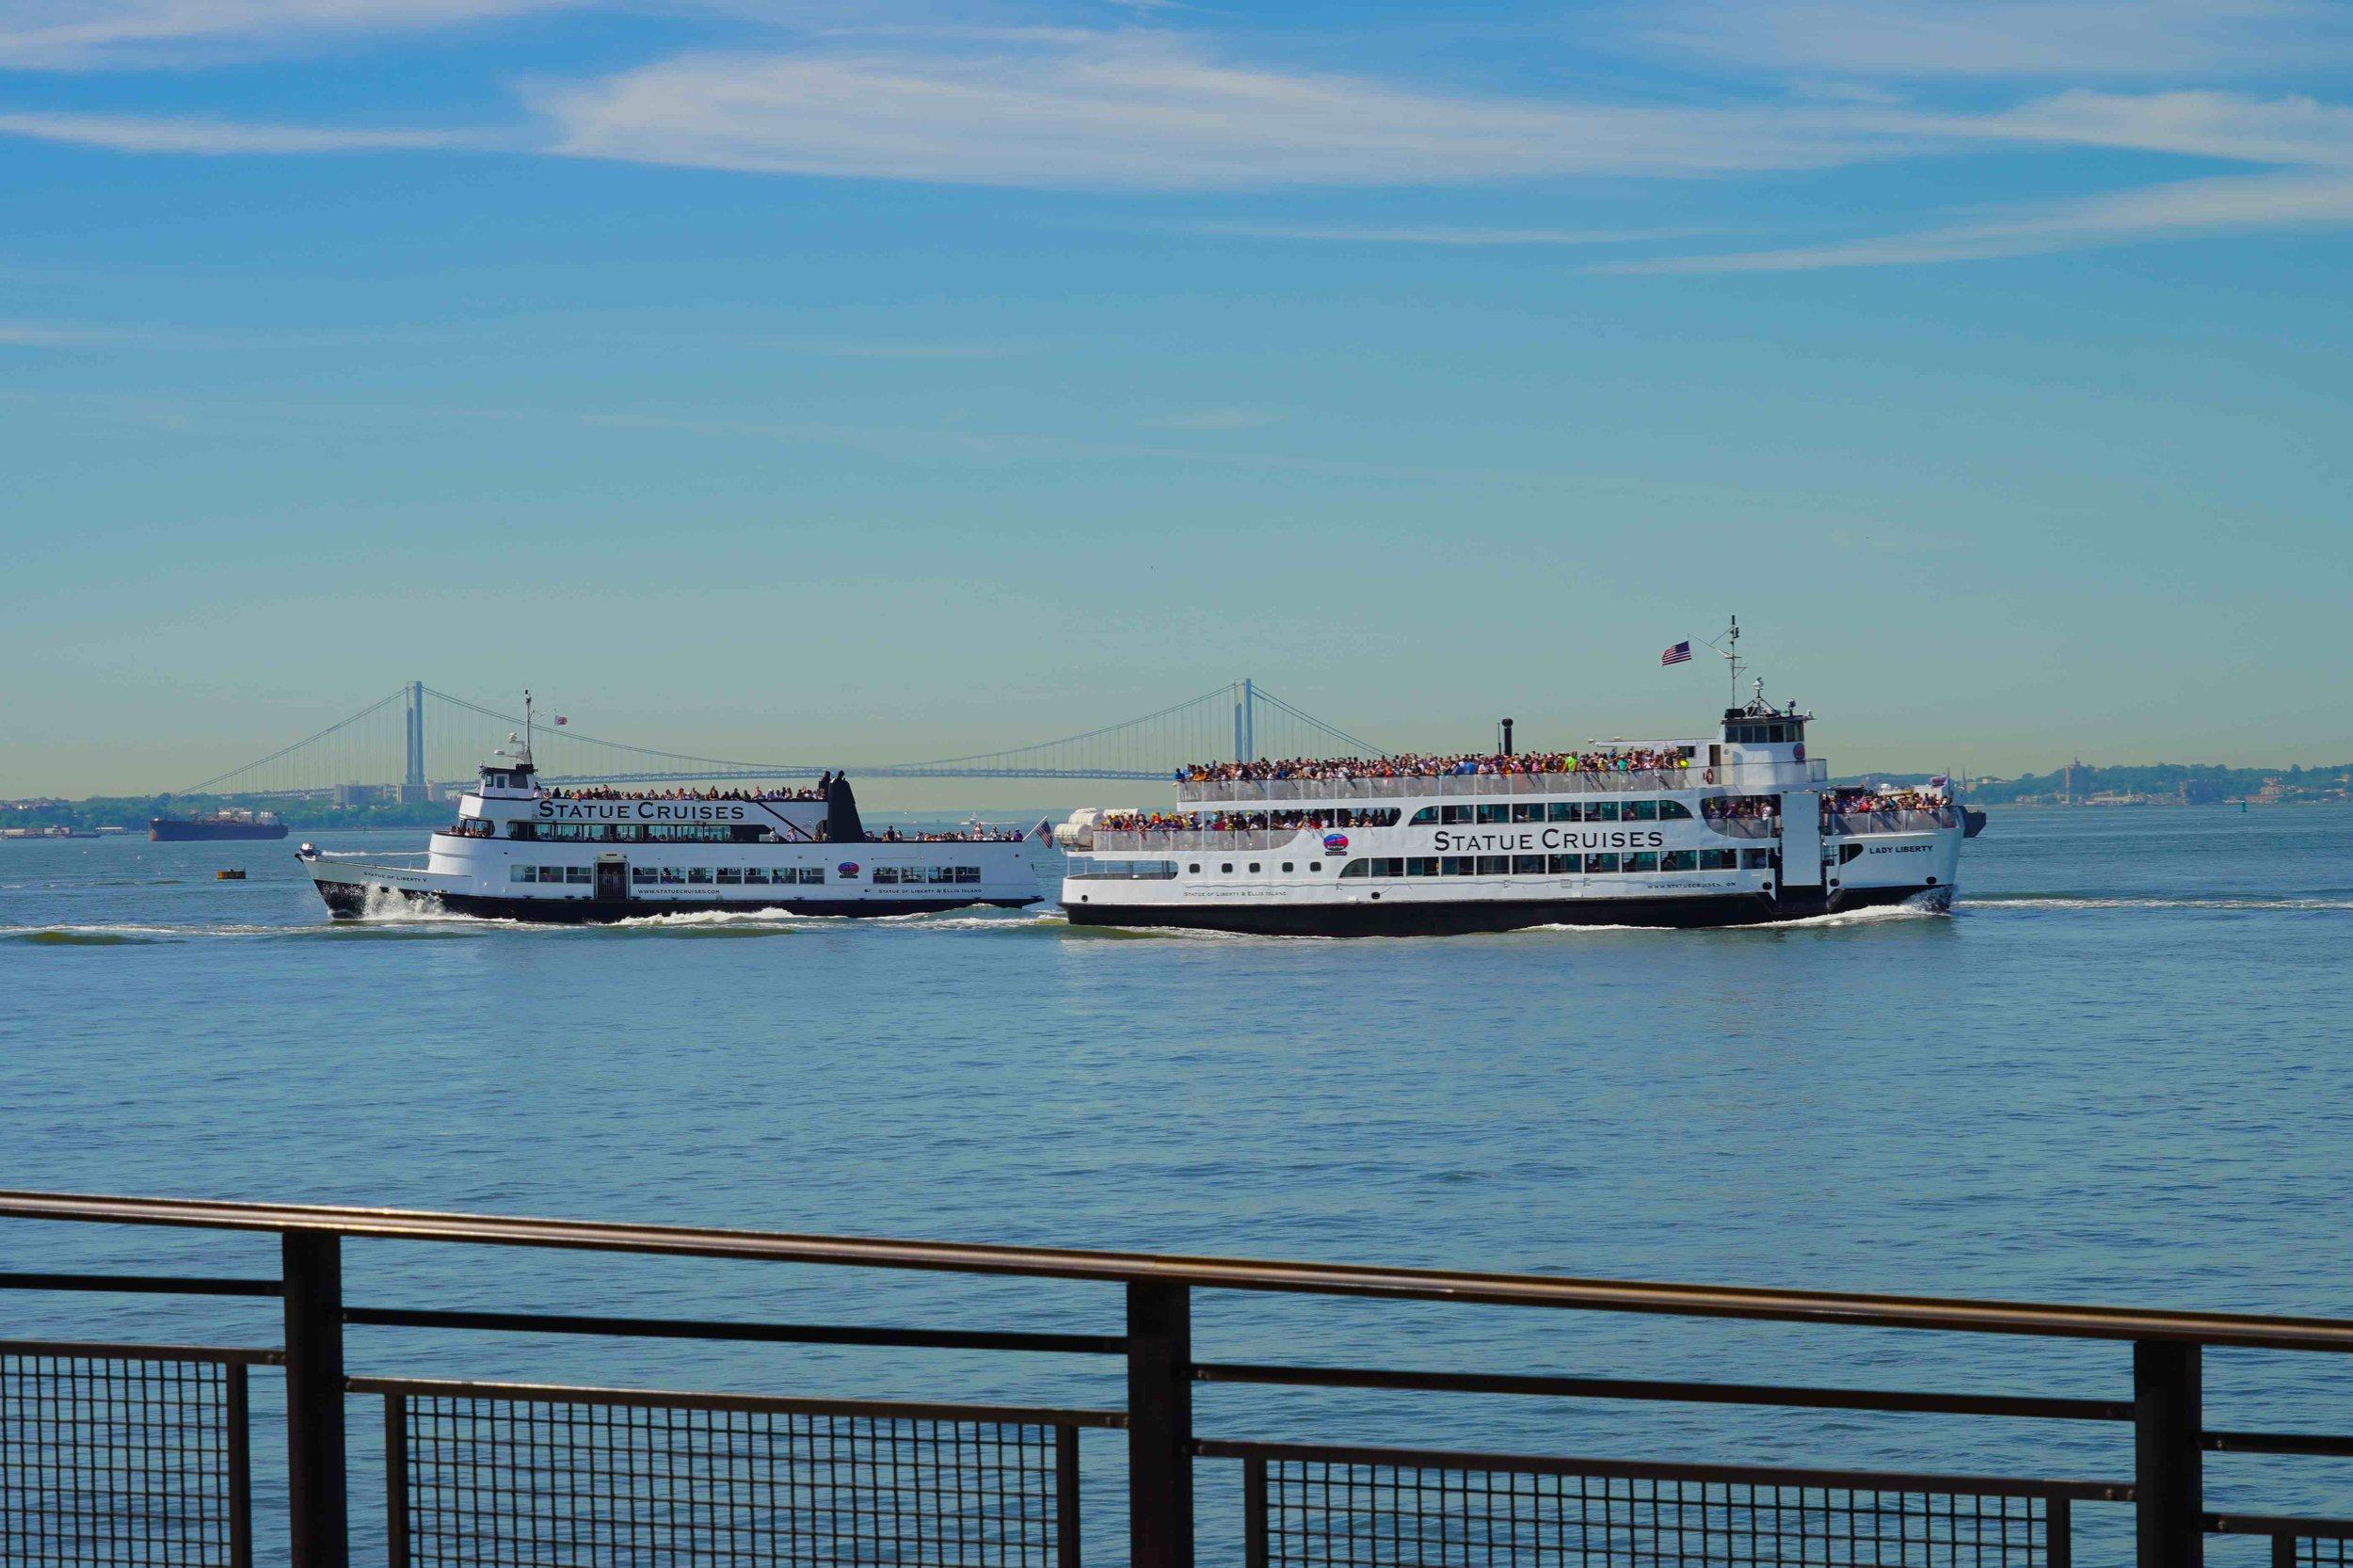 Statue Cruises Statue of Liberty NYC.jpg